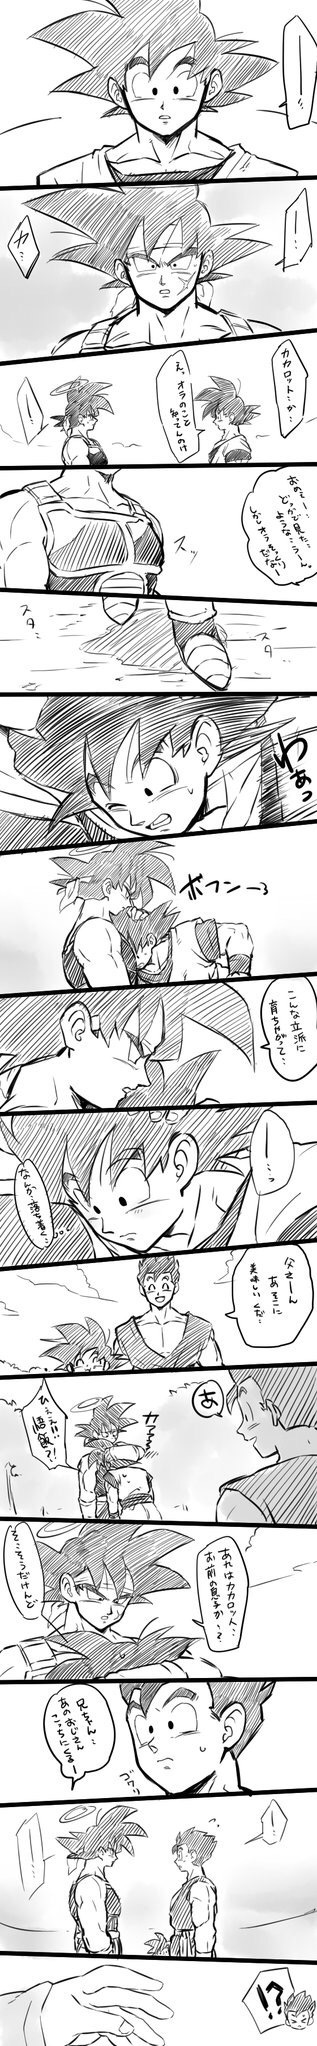 Bardock meets Goku  by leylaxdbz